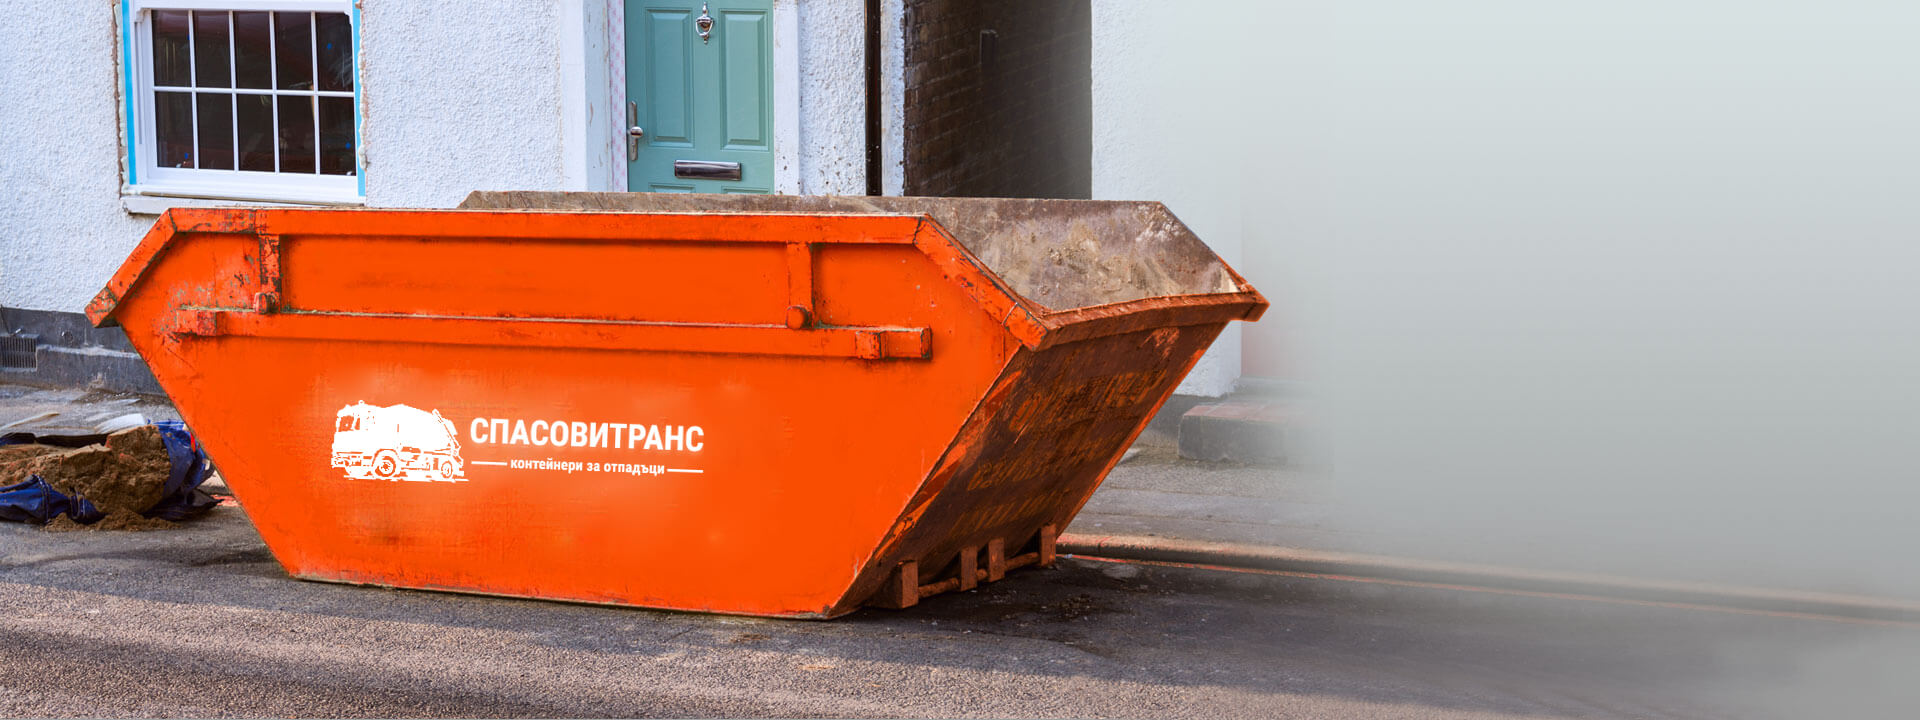 konteiner-za-otpadatsi-header